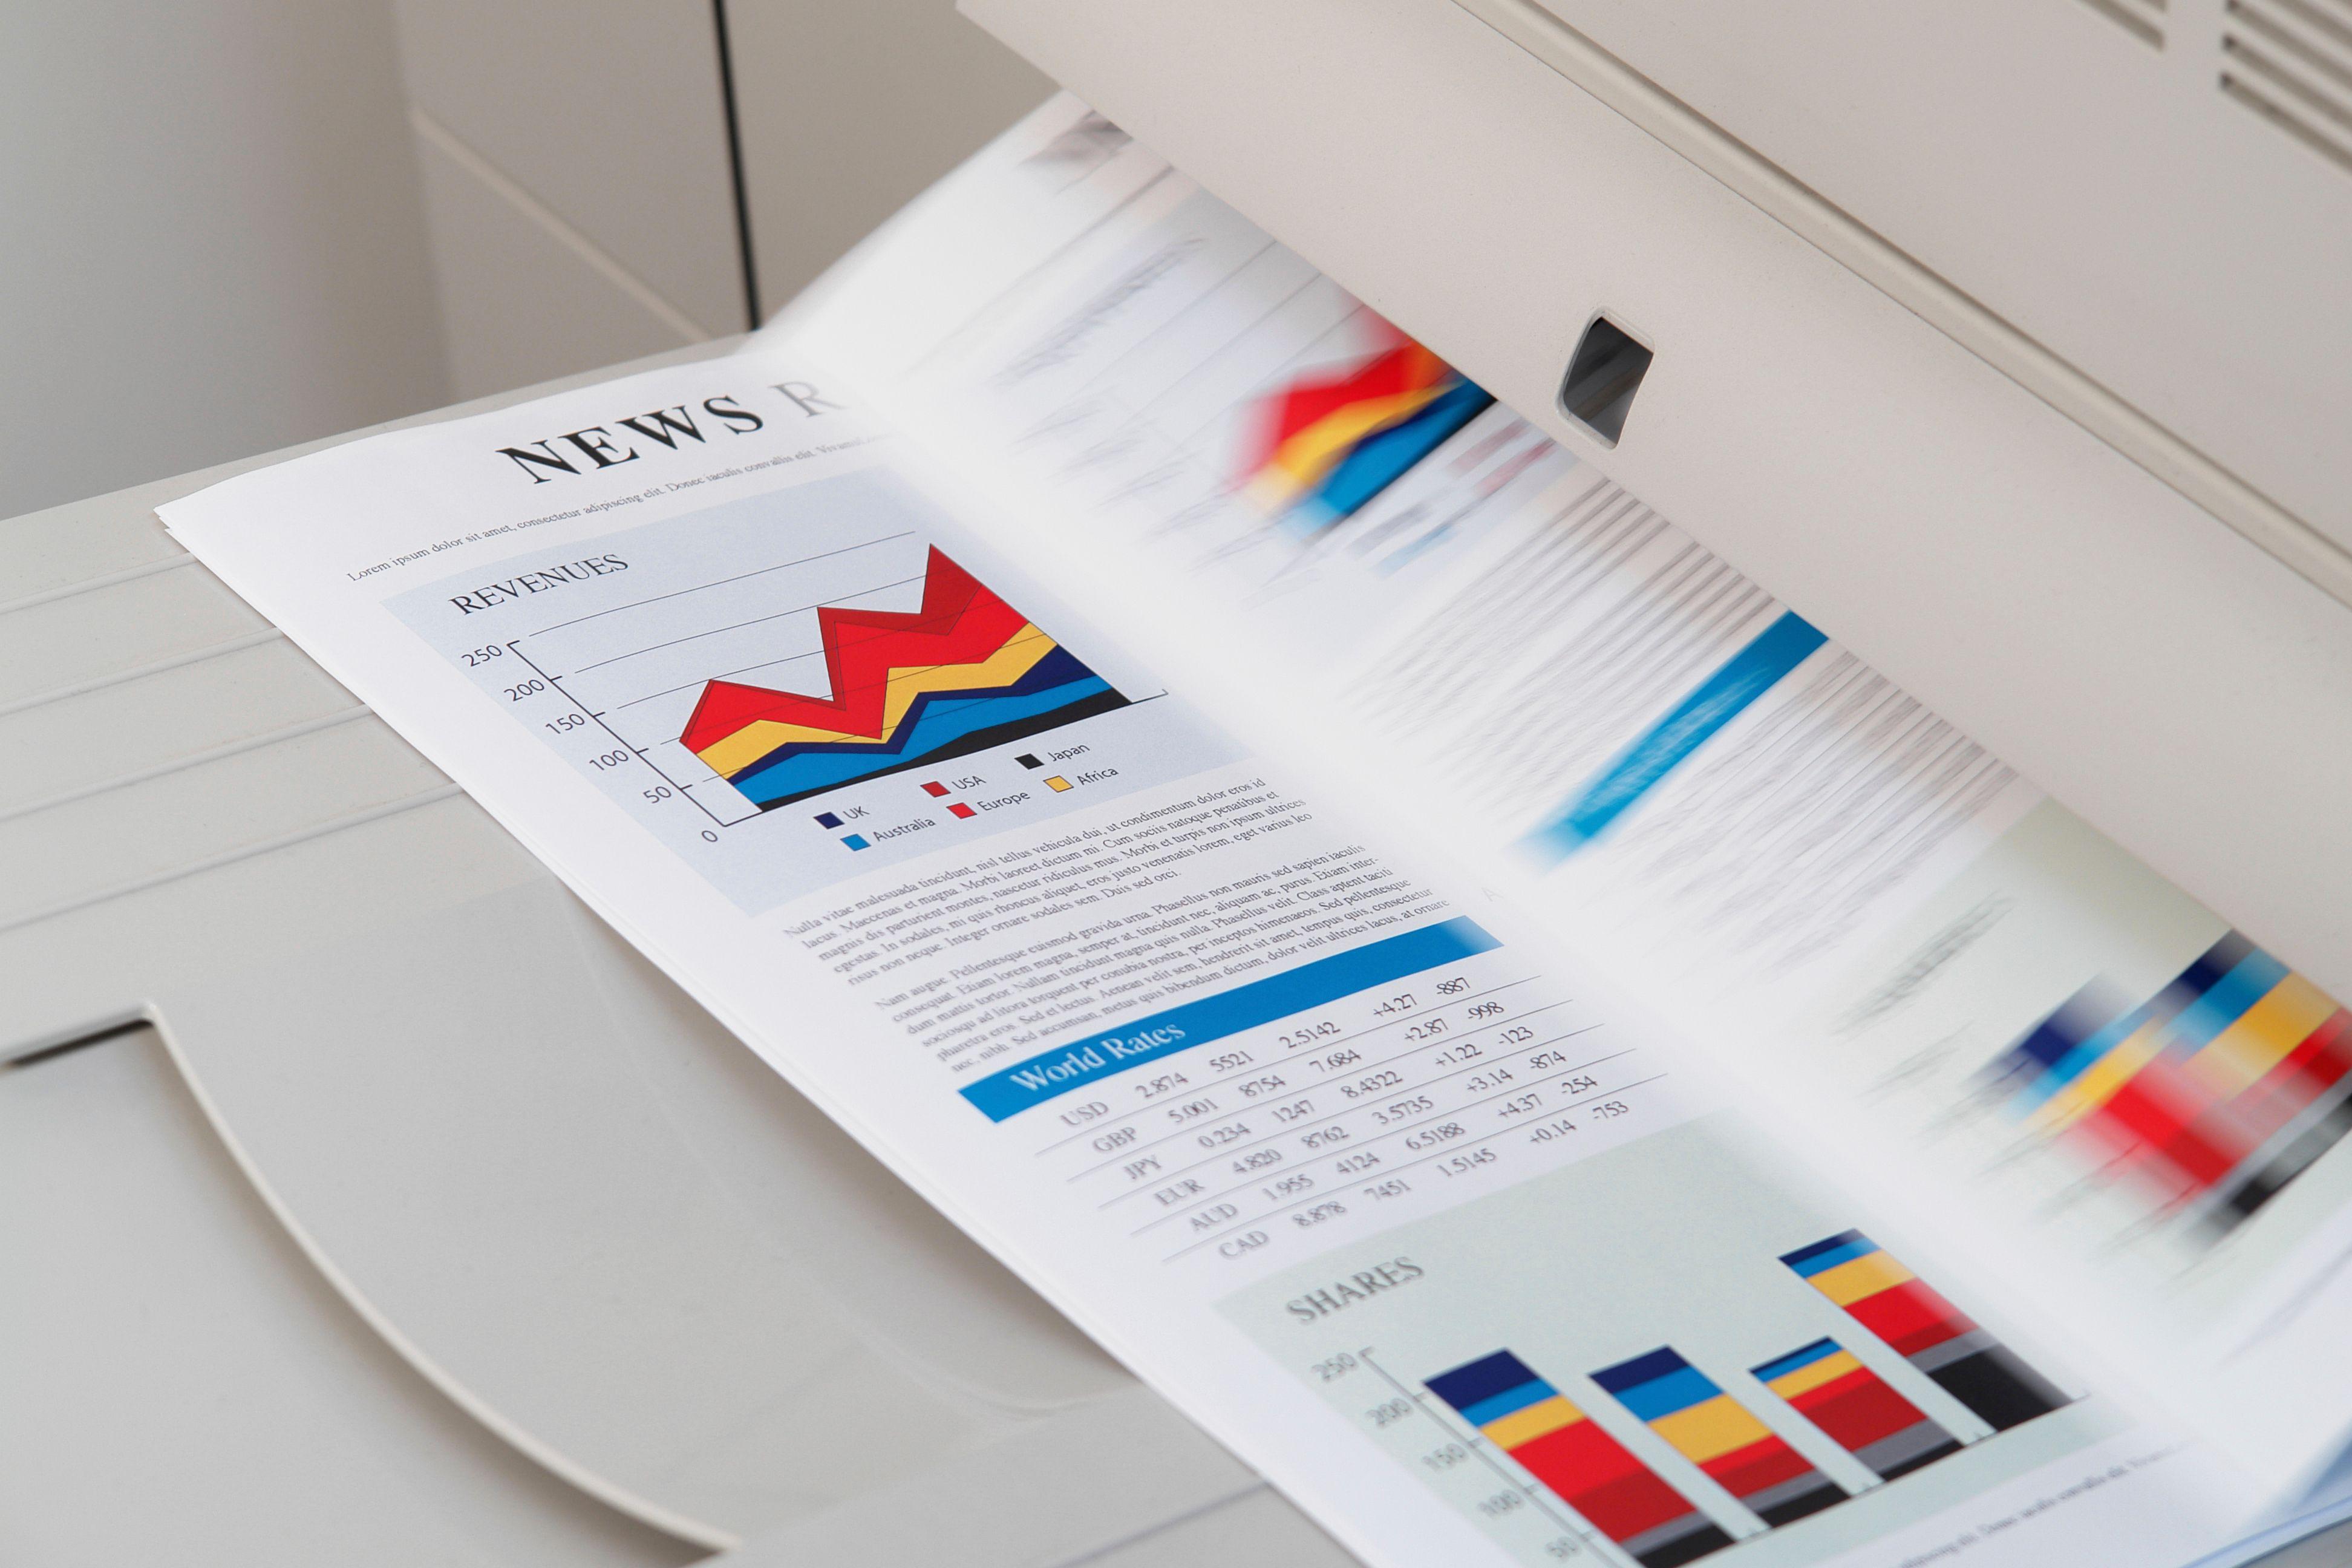 Digital Printing and Copies.....MASSIVE Production Capabilities.